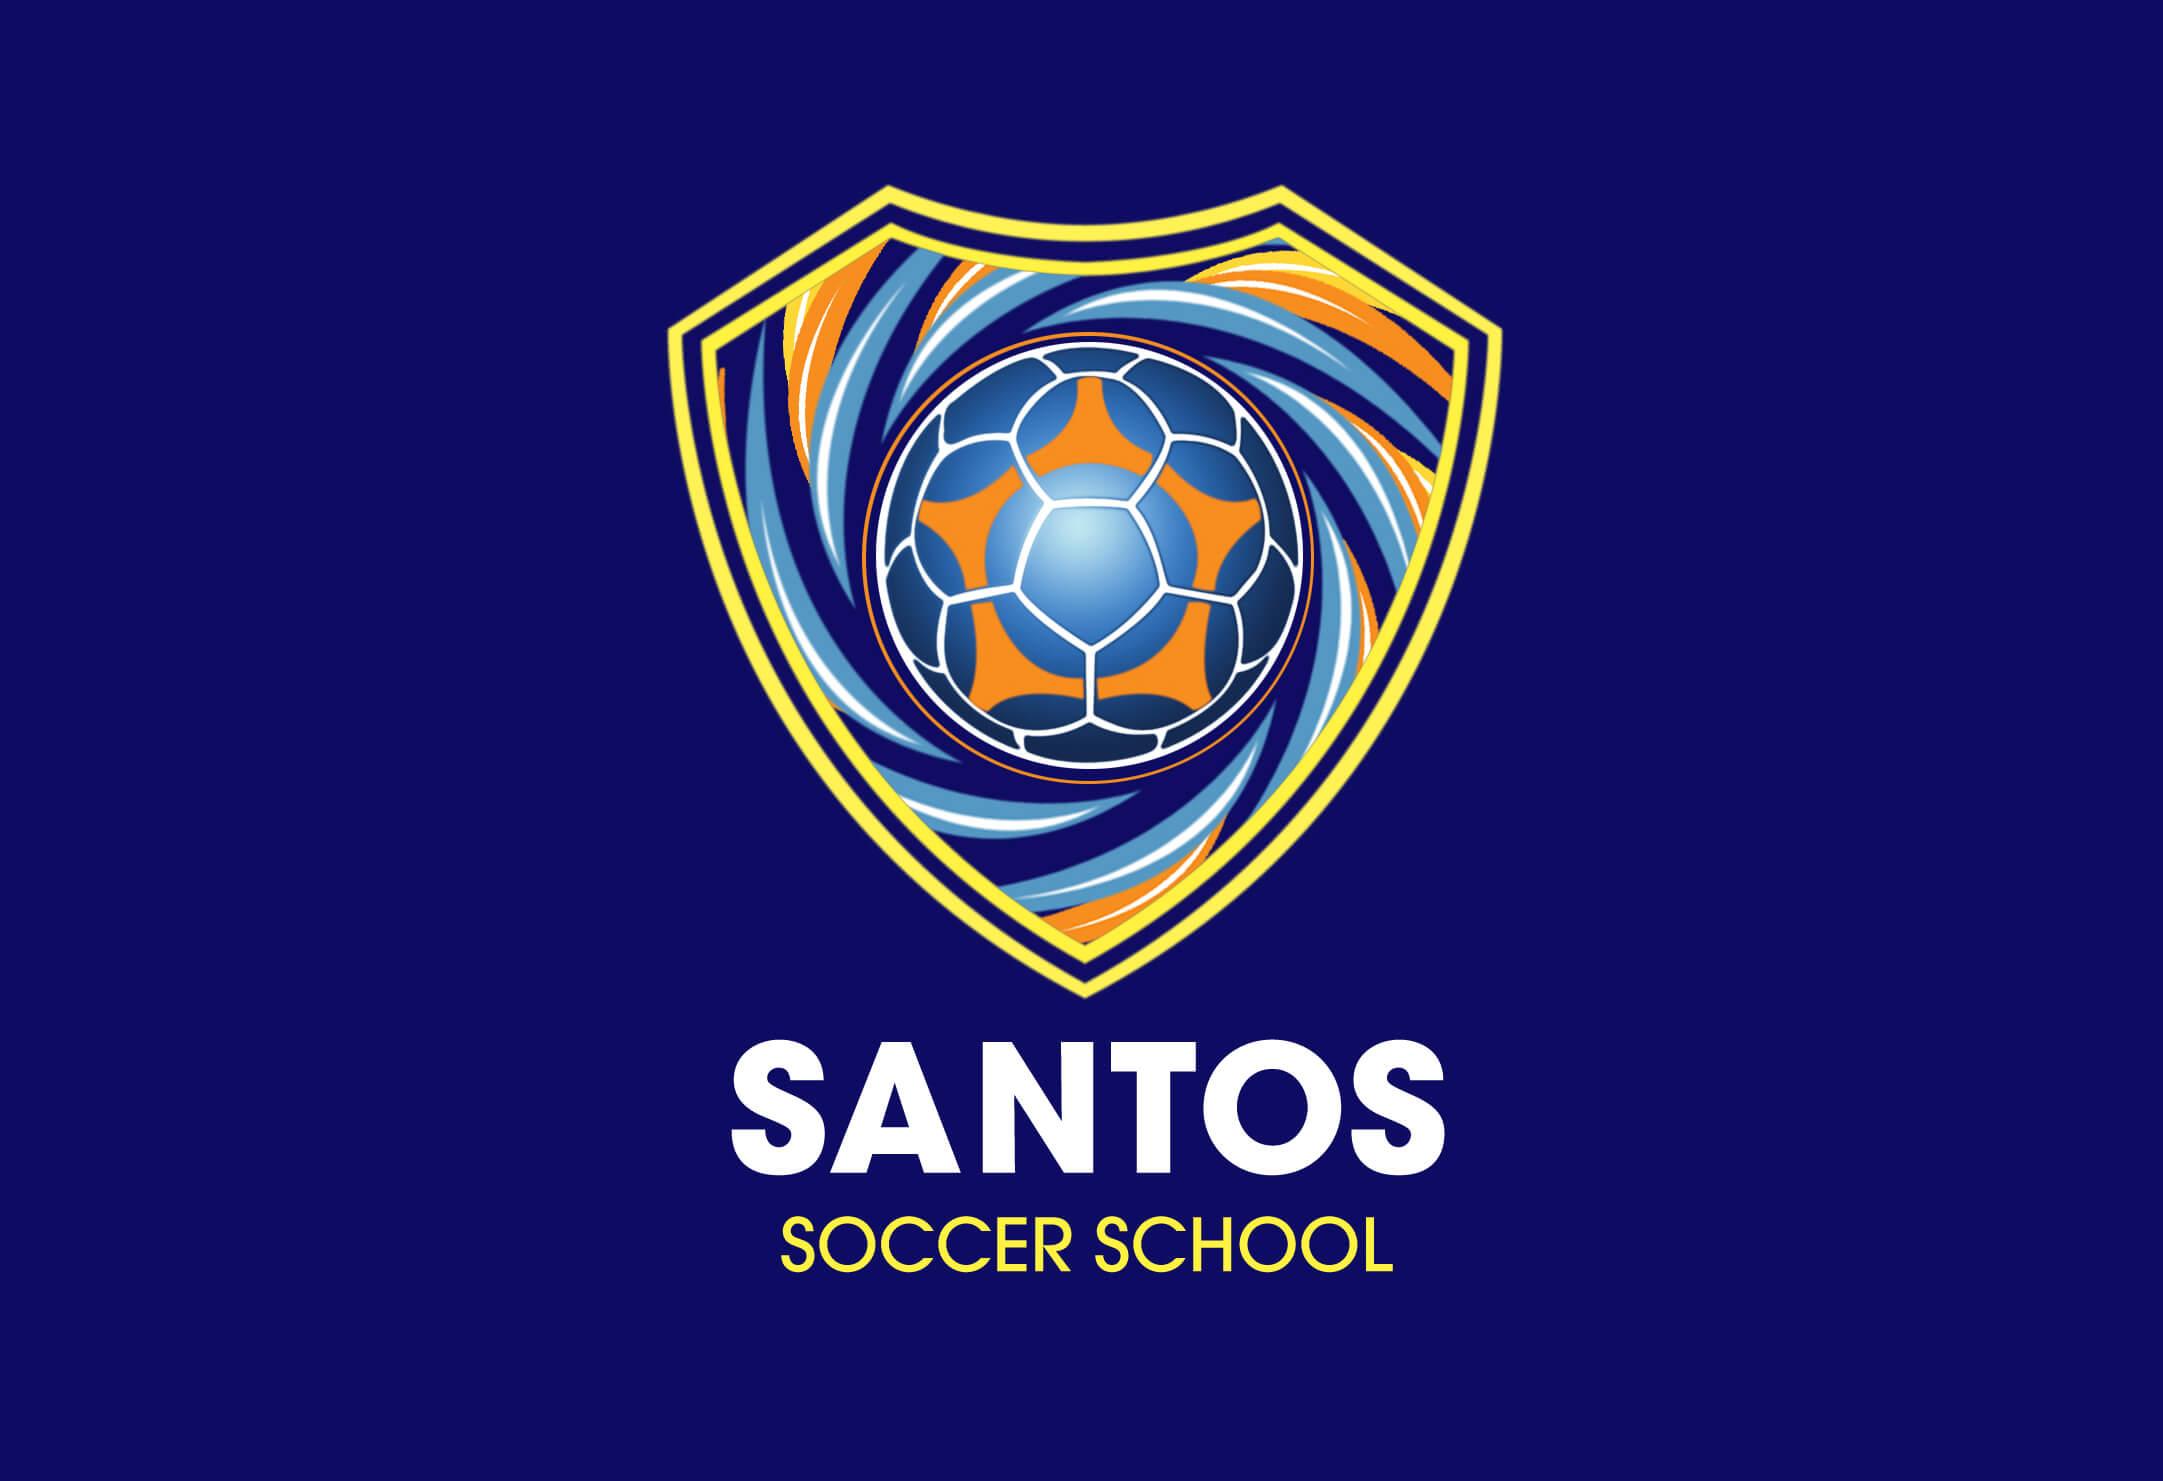 Santos Soccor School logo